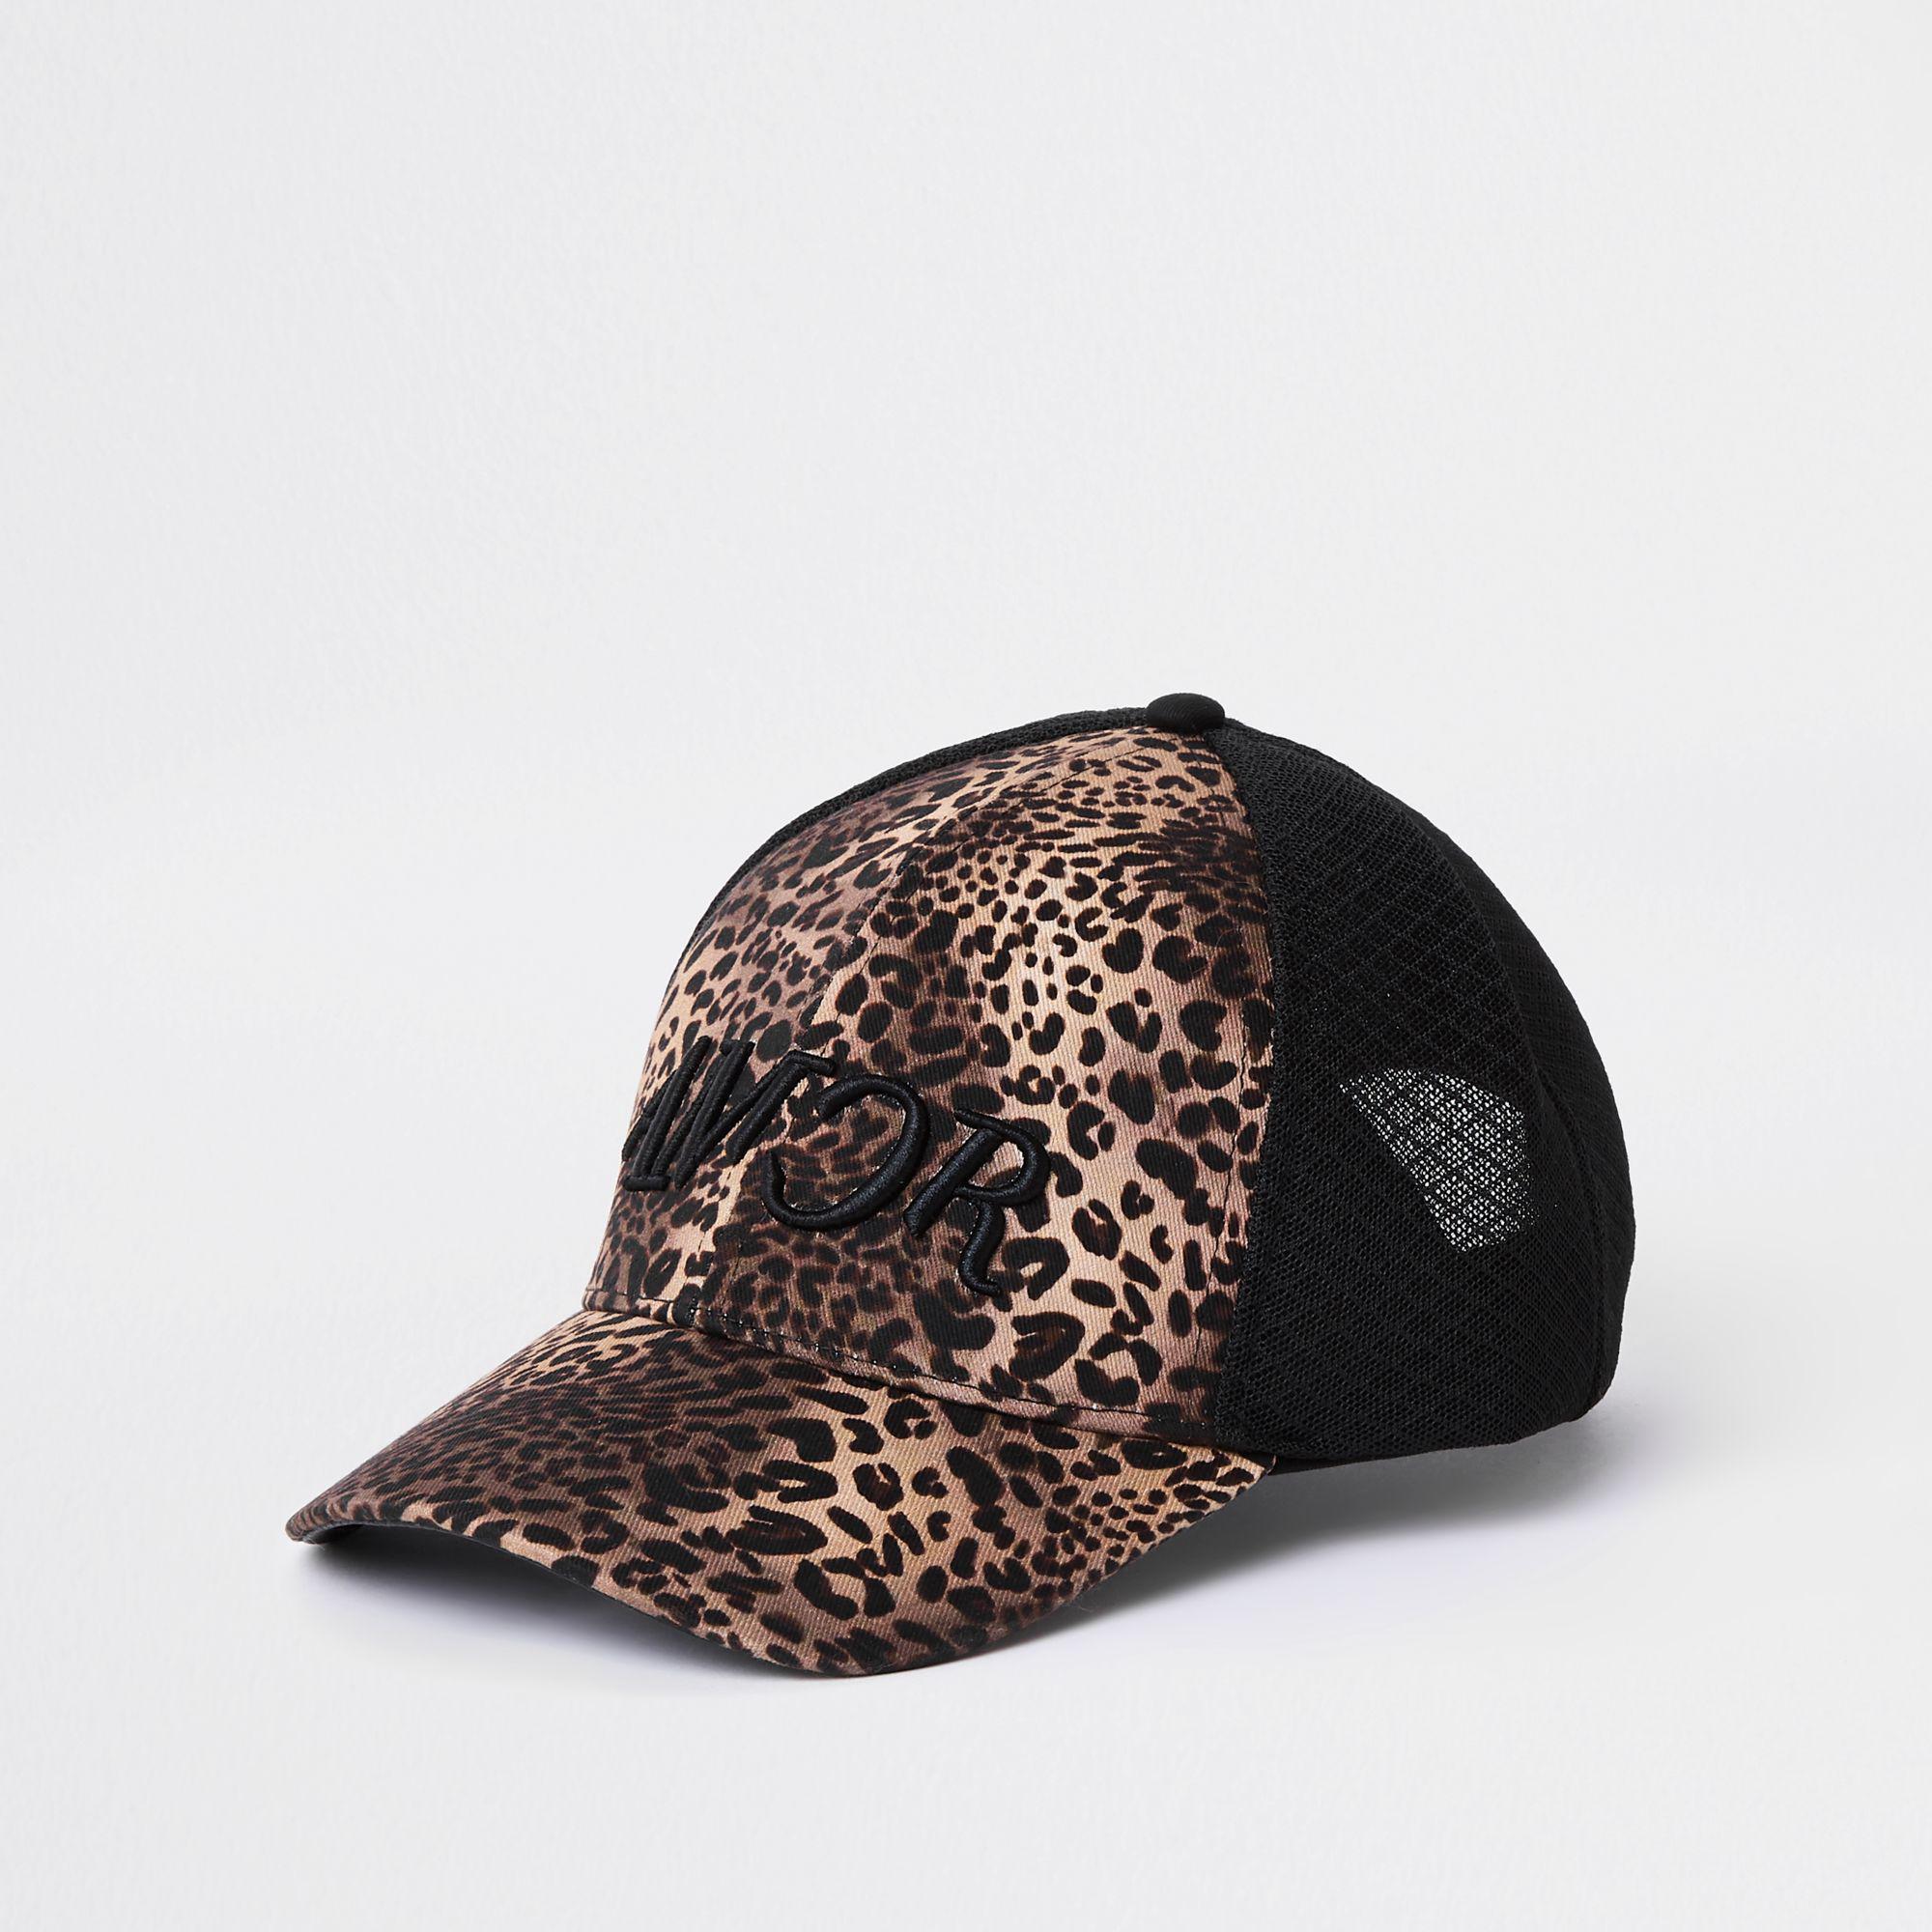 11eaa1c6dc2 River Island Leopard Print Mesh Baseball Cap in Black for Men - Lyst